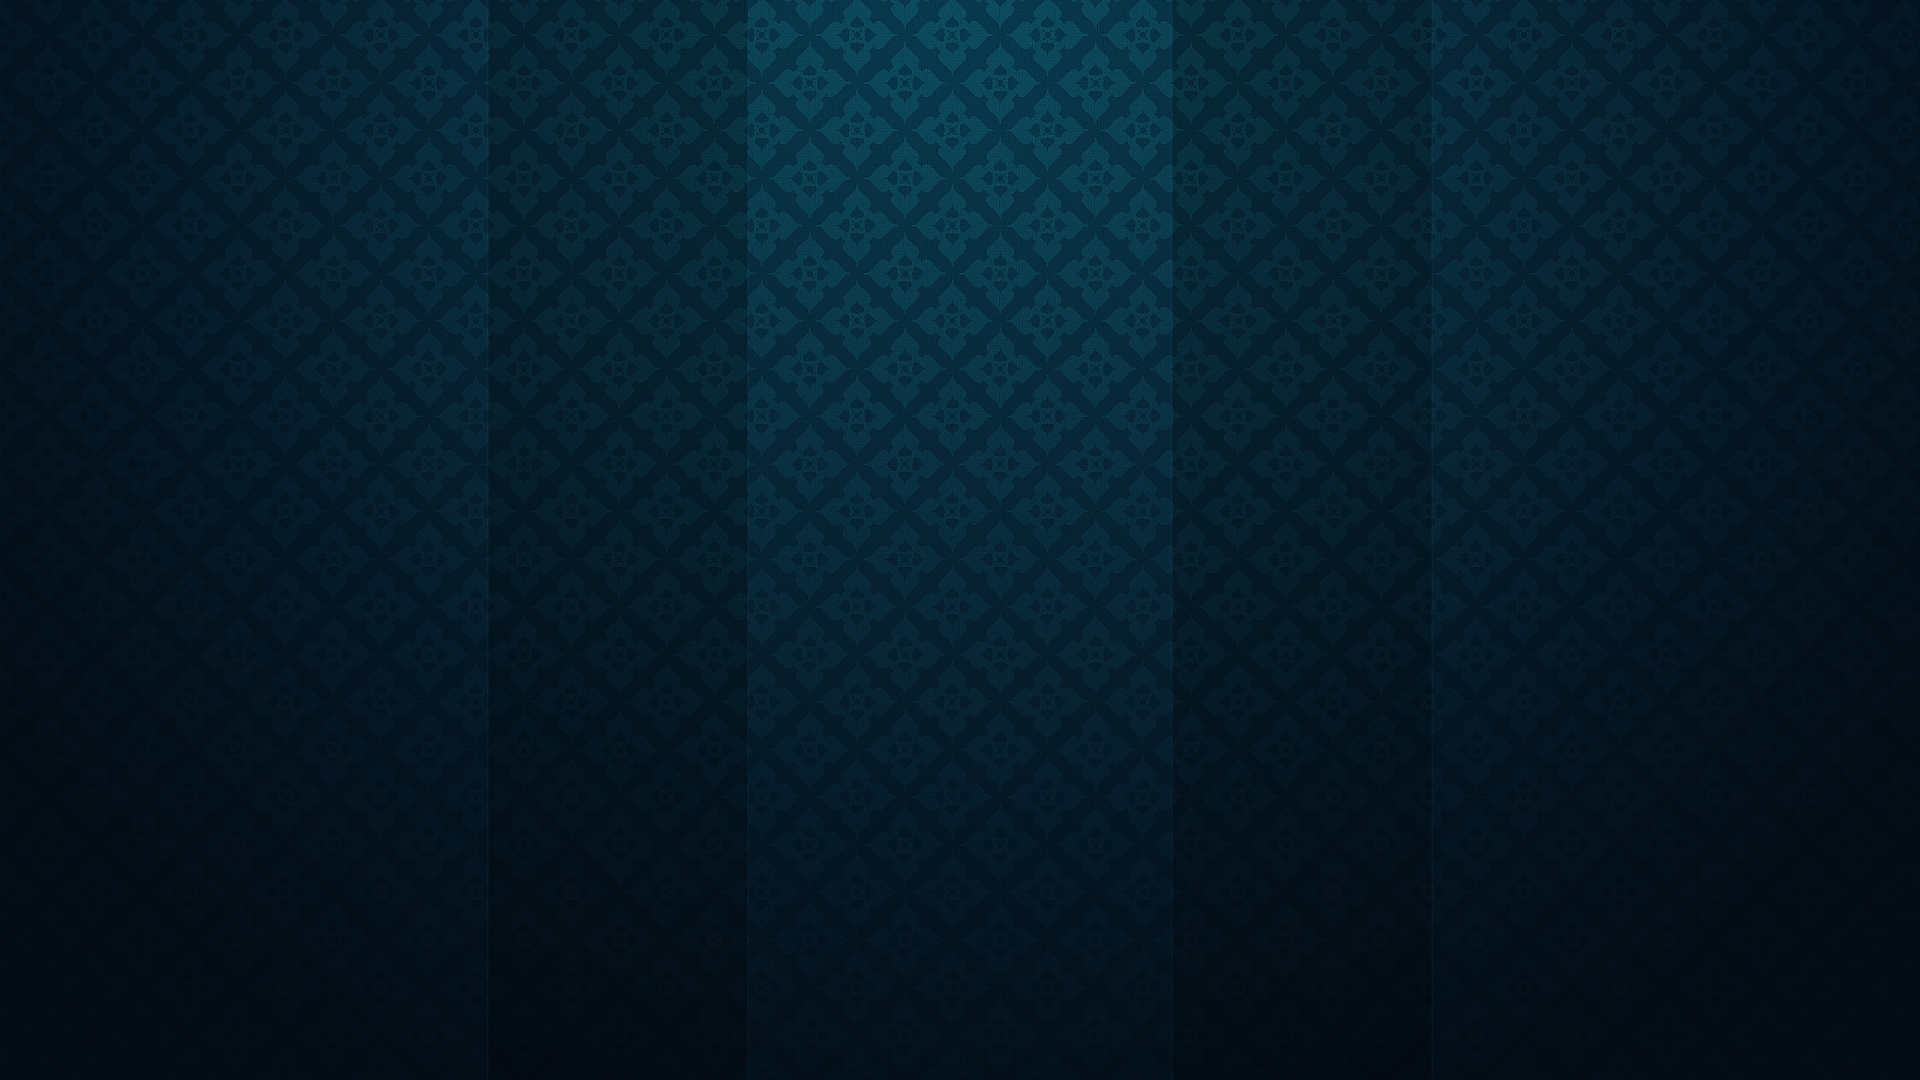 Diamond pattern World 1920x1080 highreshdwallpaperscom 1920x1080